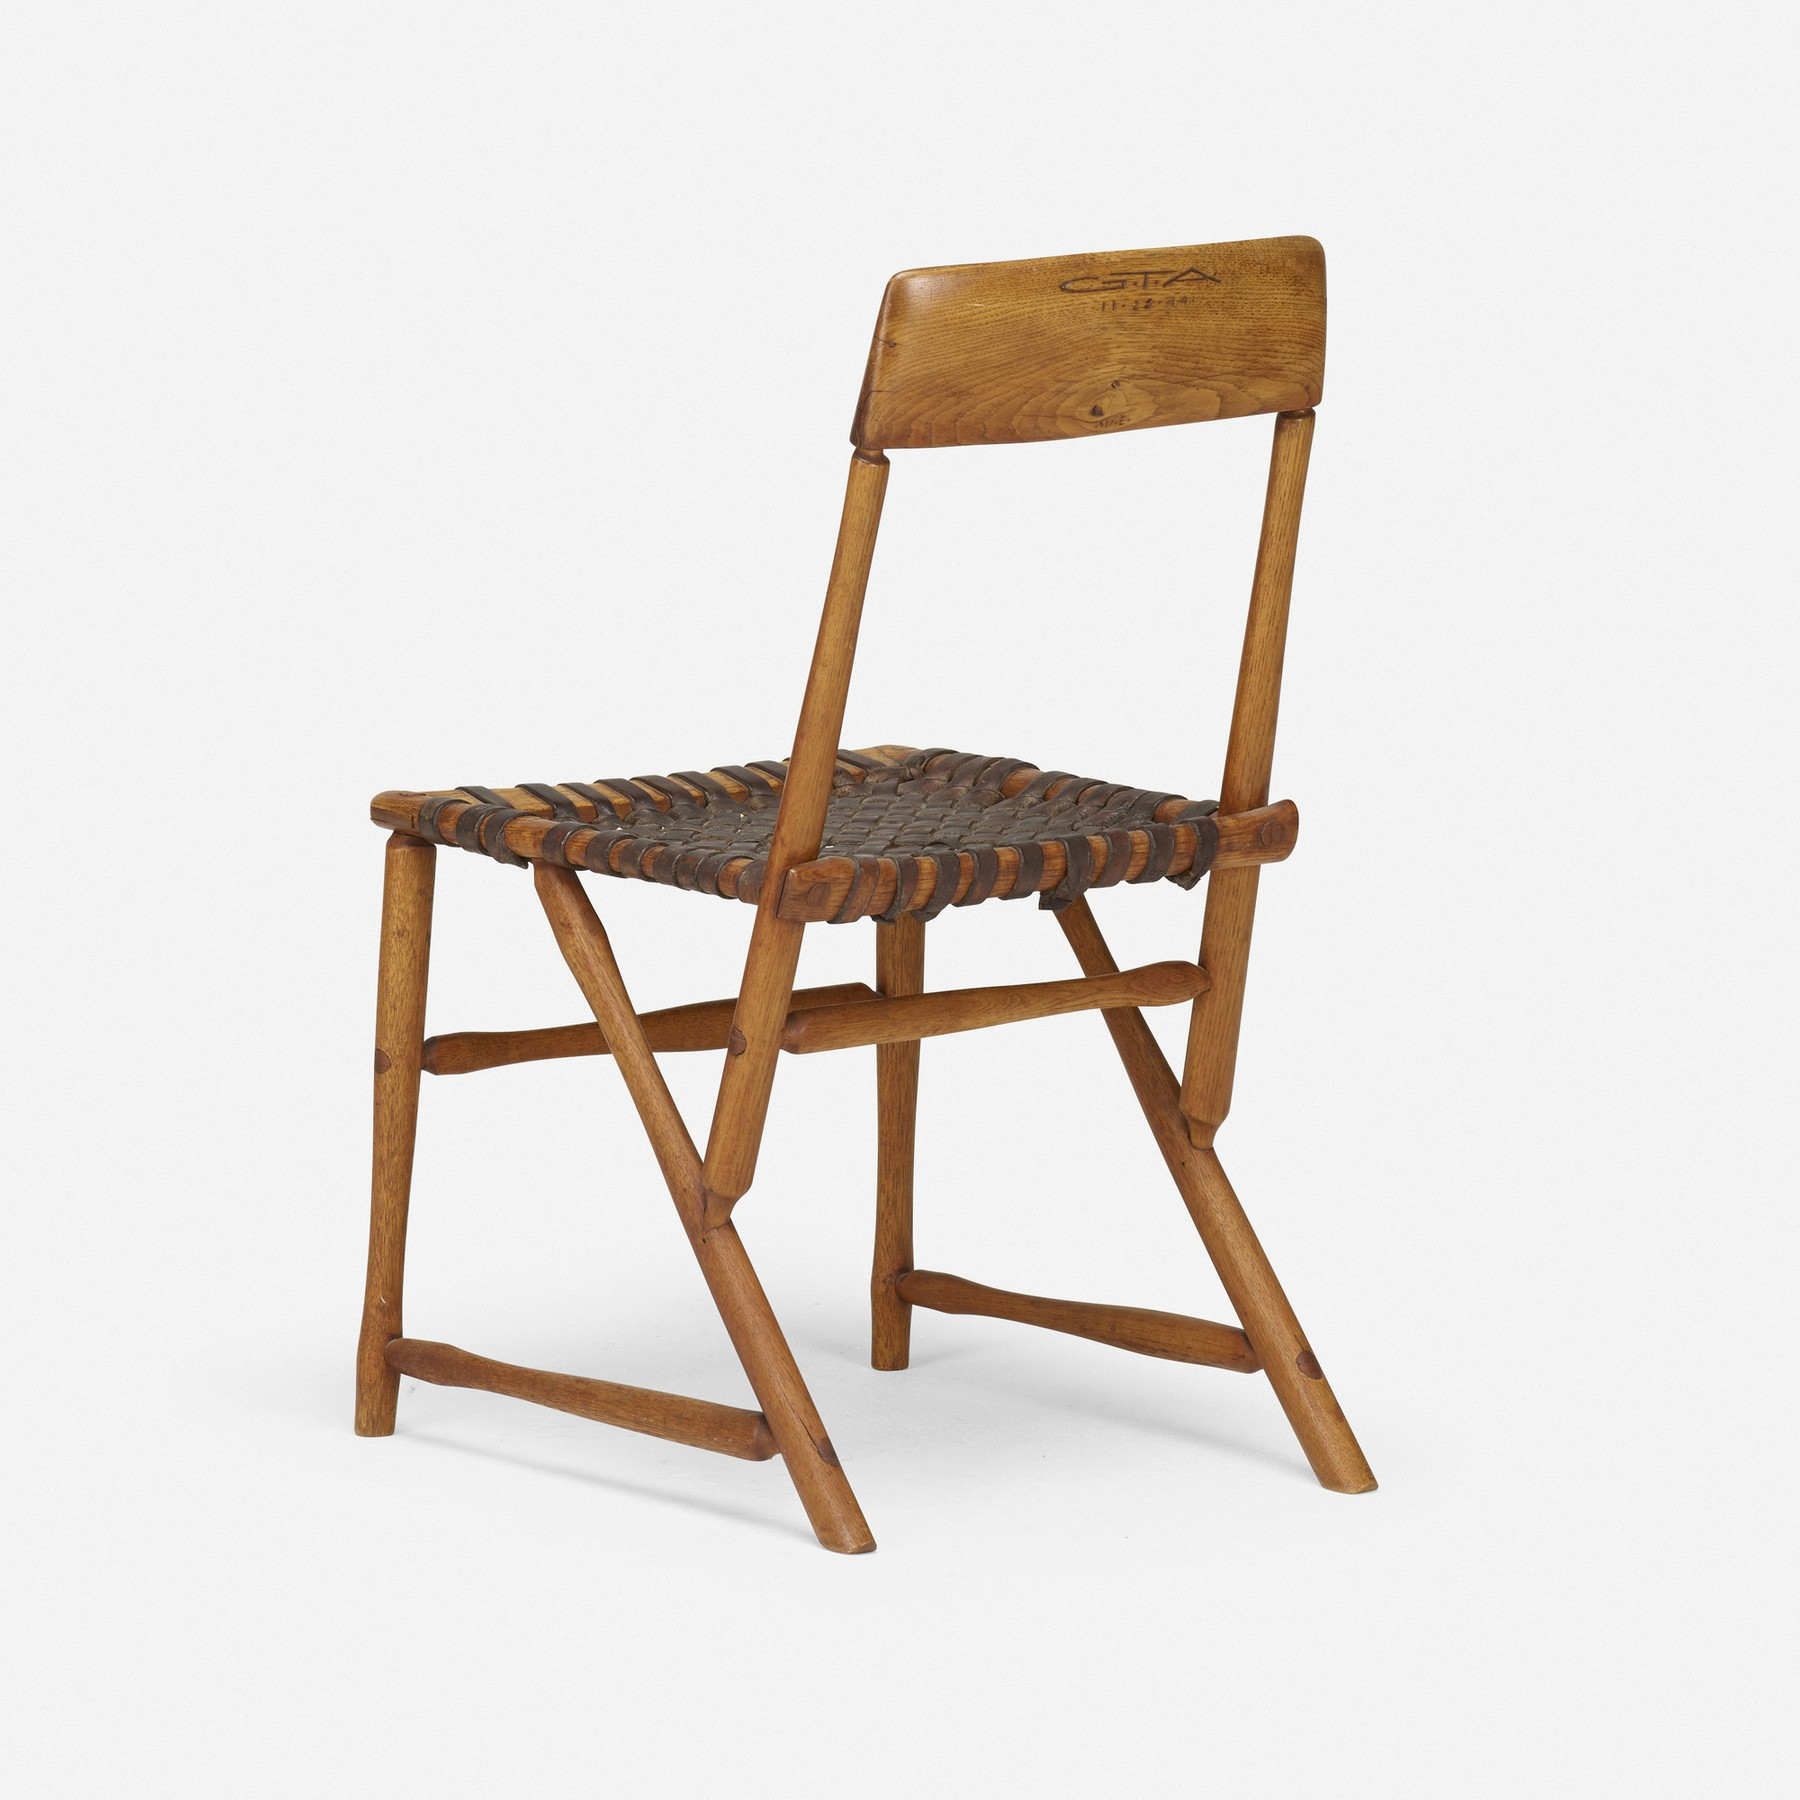 449_3_modern_design_january_2021_wharton_esherick_hammer_handle_chair__rago_auction.jpg?t=1610030939